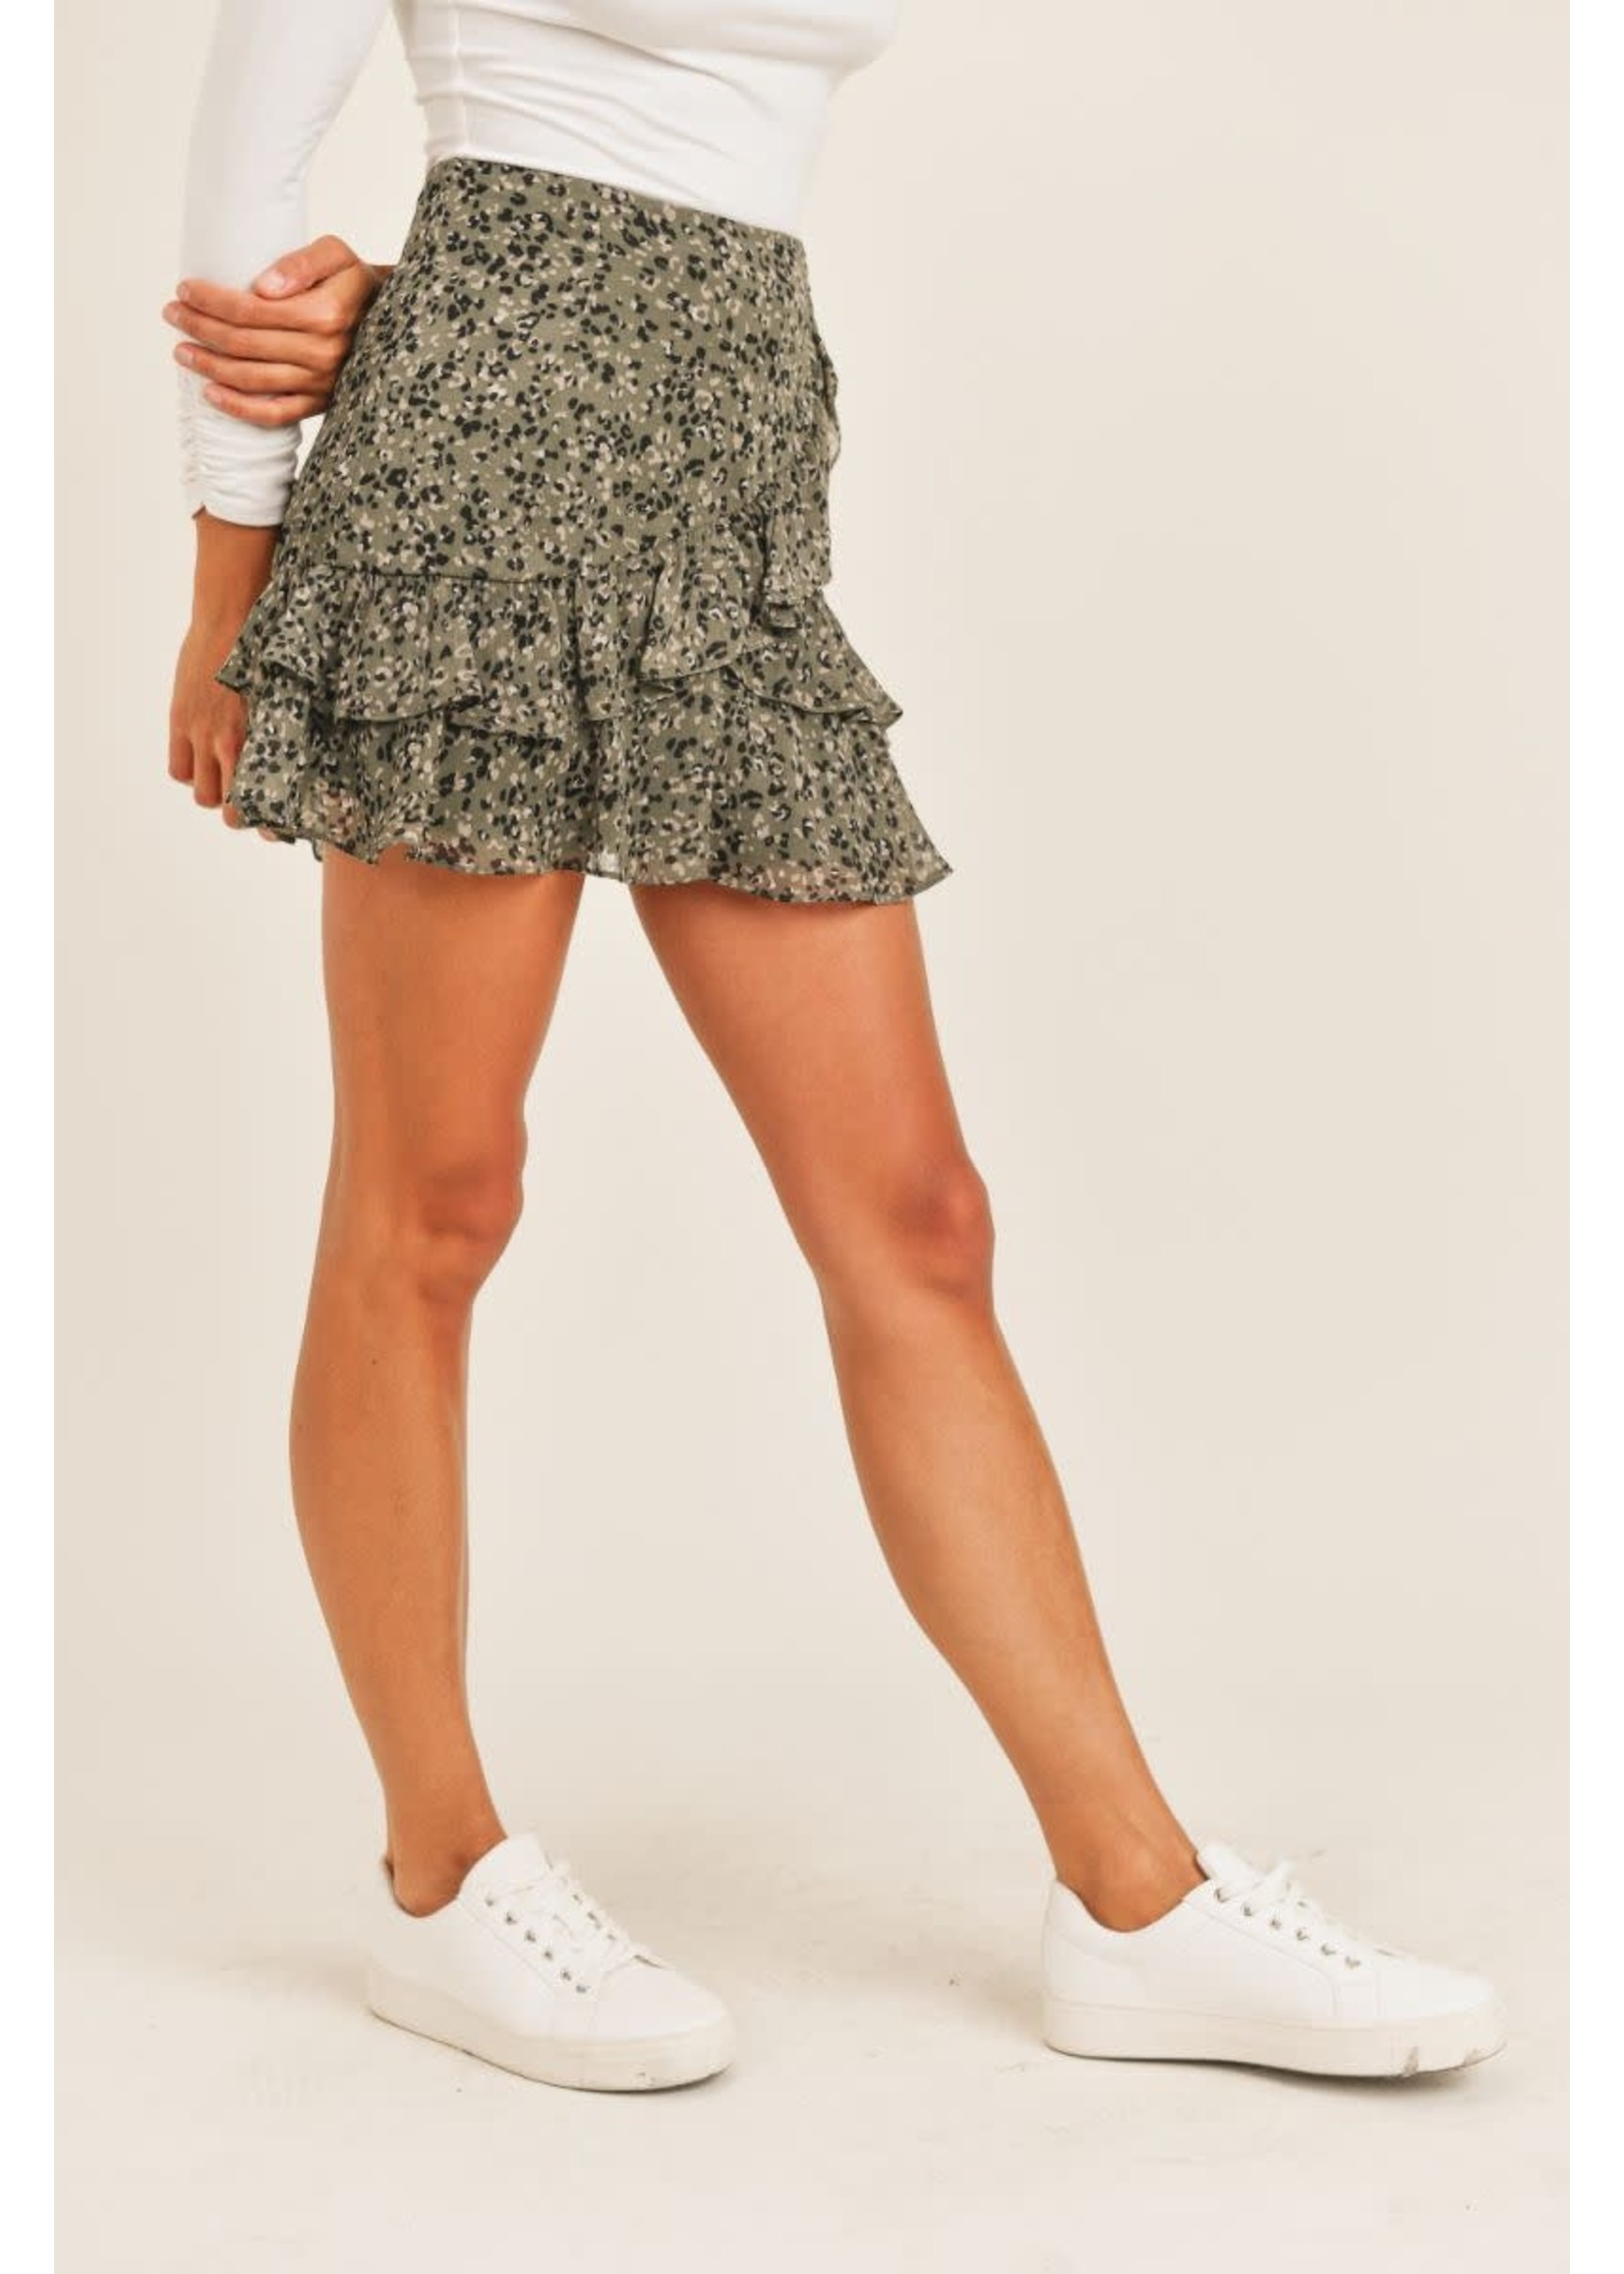 Sadie & Sage Wild Heart Skirt - AC361550